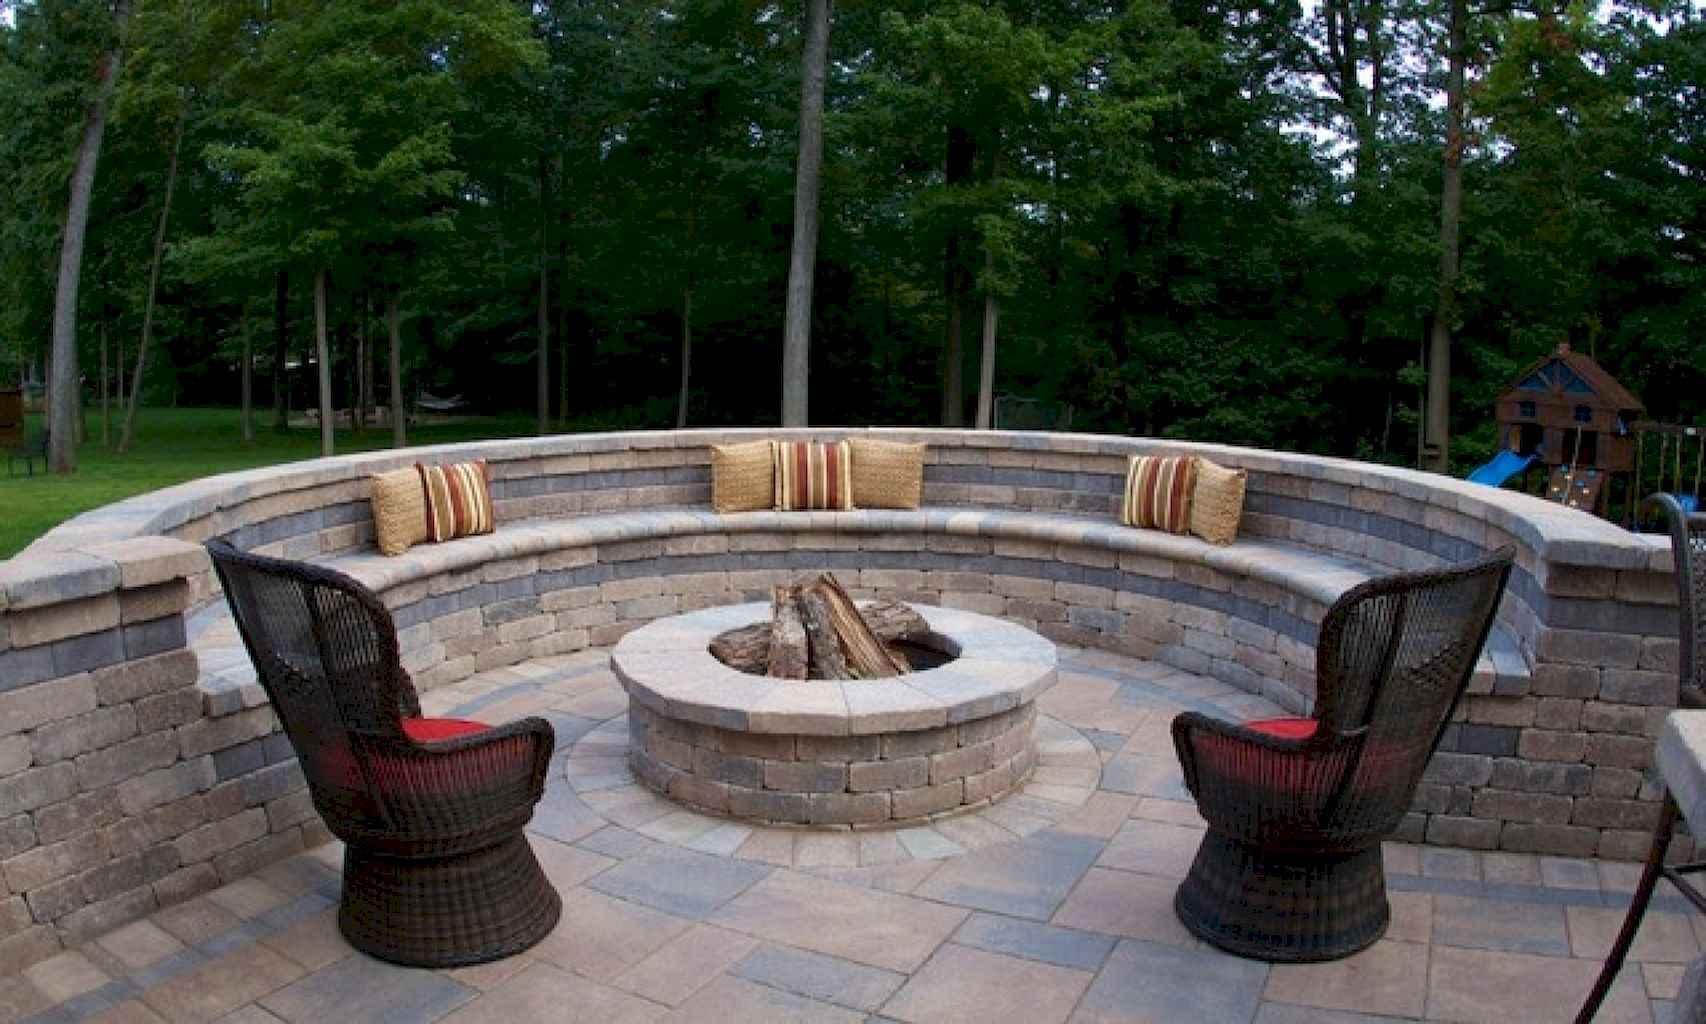 60 Beautiful Backyard Fire Pit Ideas Decoration and Remodel (41)